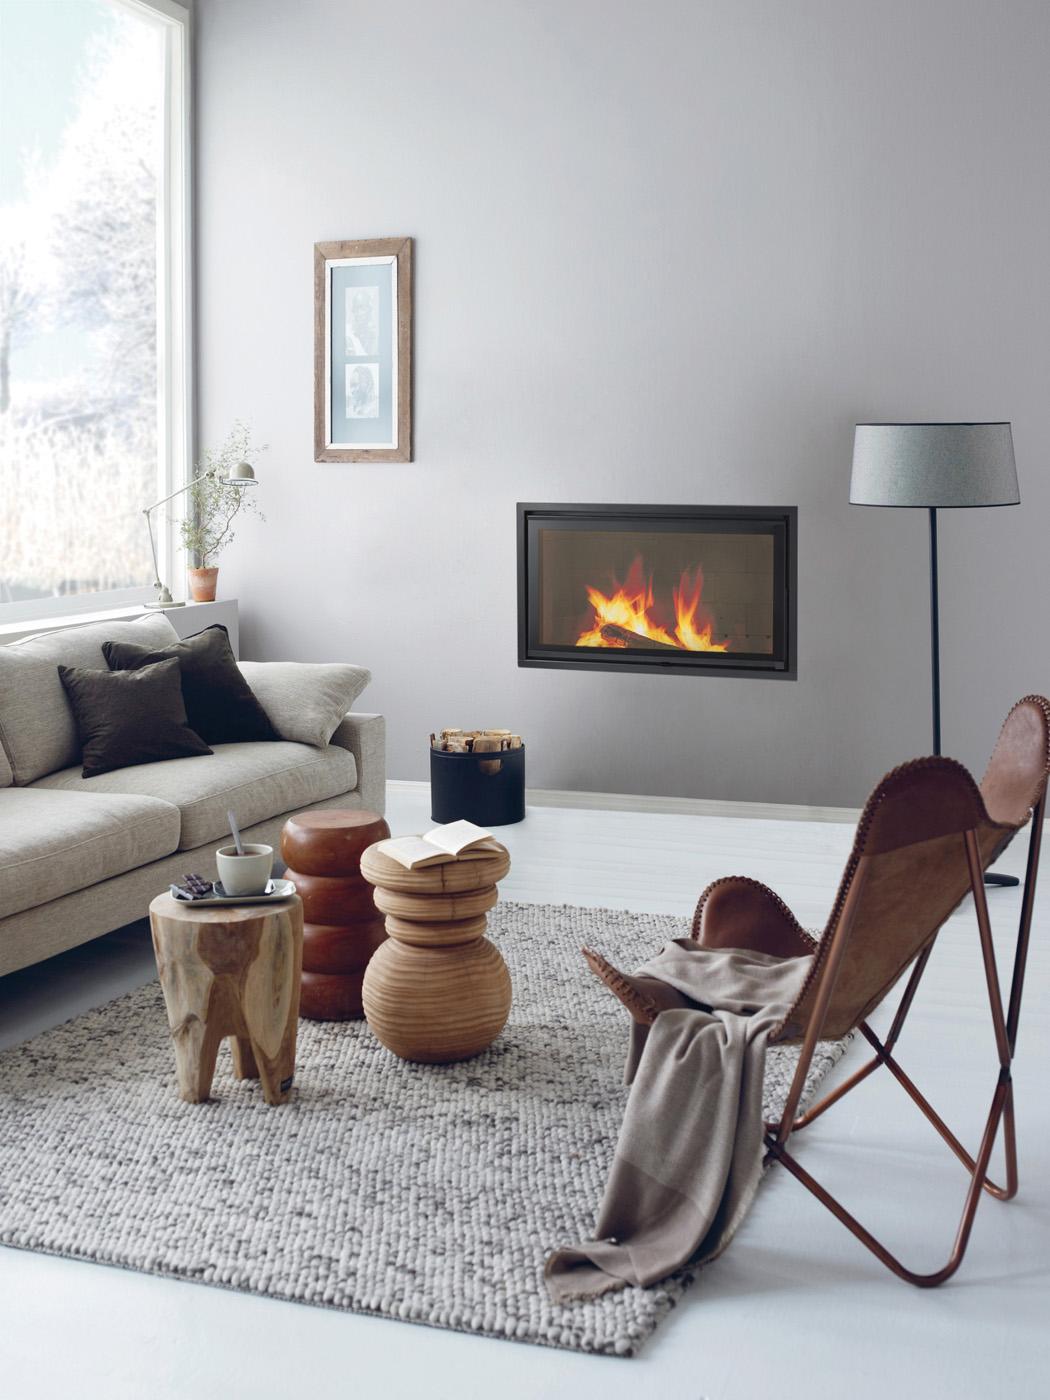 chemin es atra le coeur de votre chemin e sur mesure. Black Bedroom Furniture Sets. Home Design Ideas